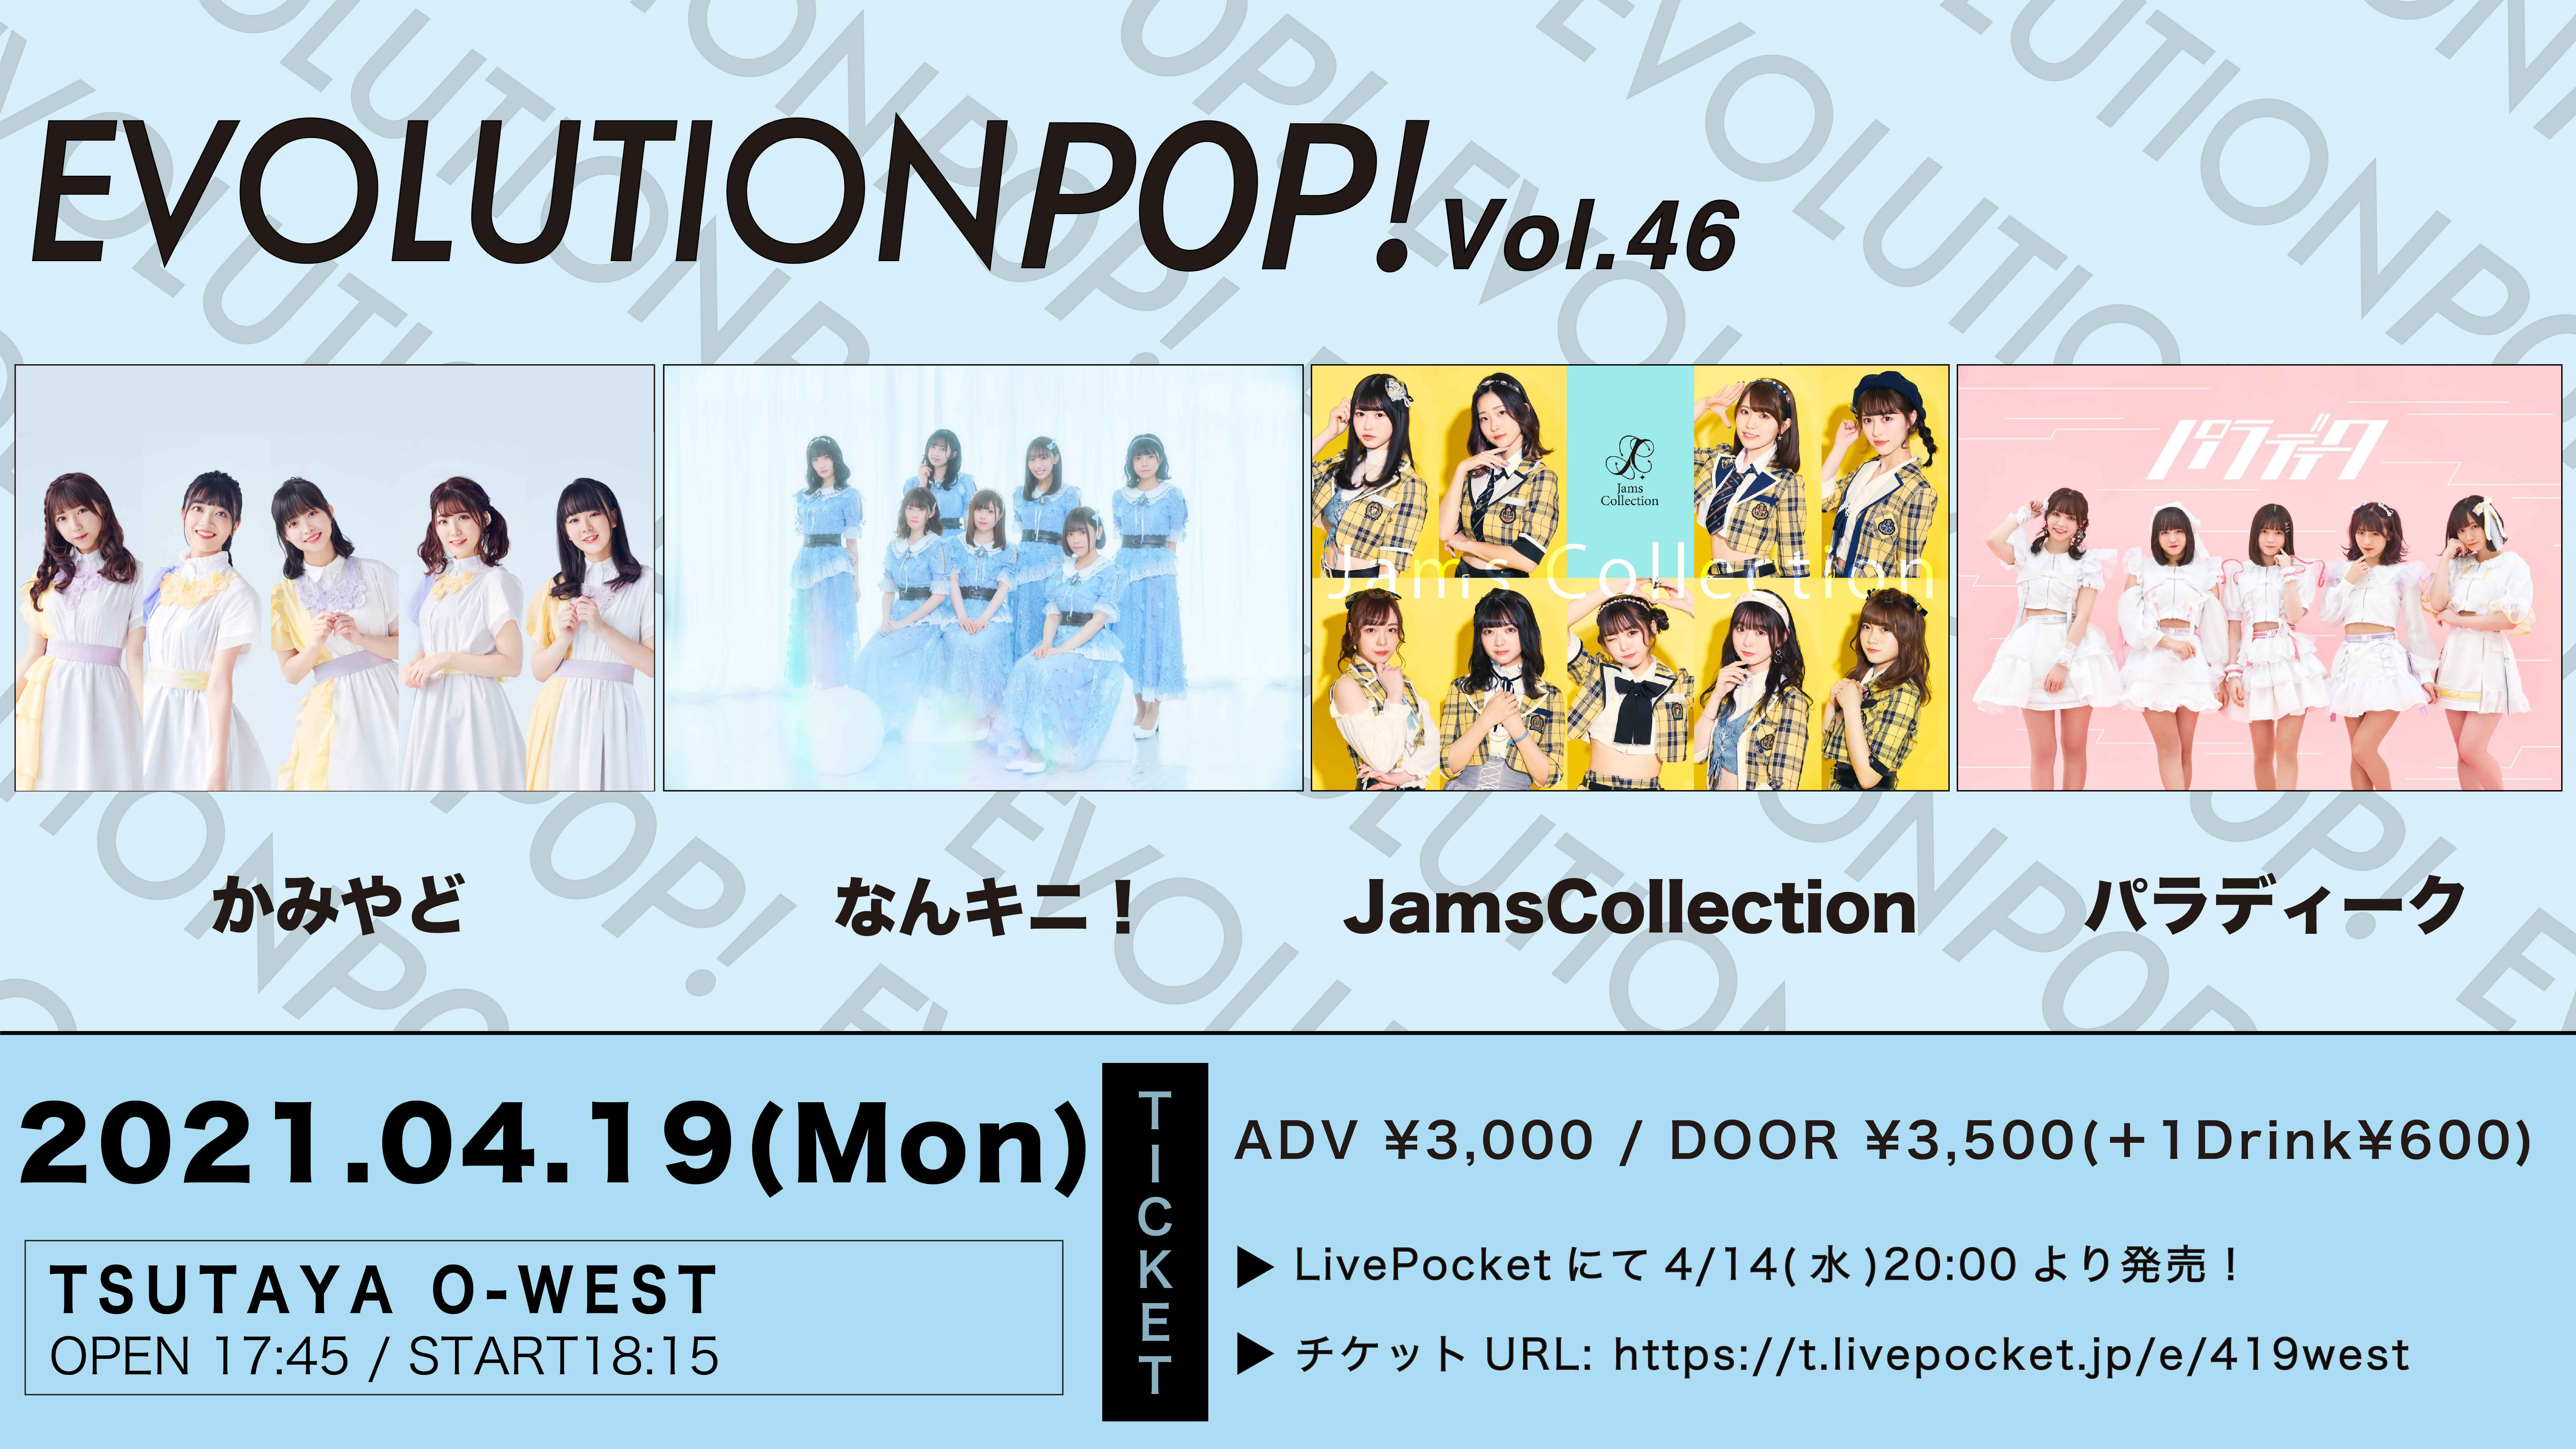 EVOLUTION POP!  Vol.46